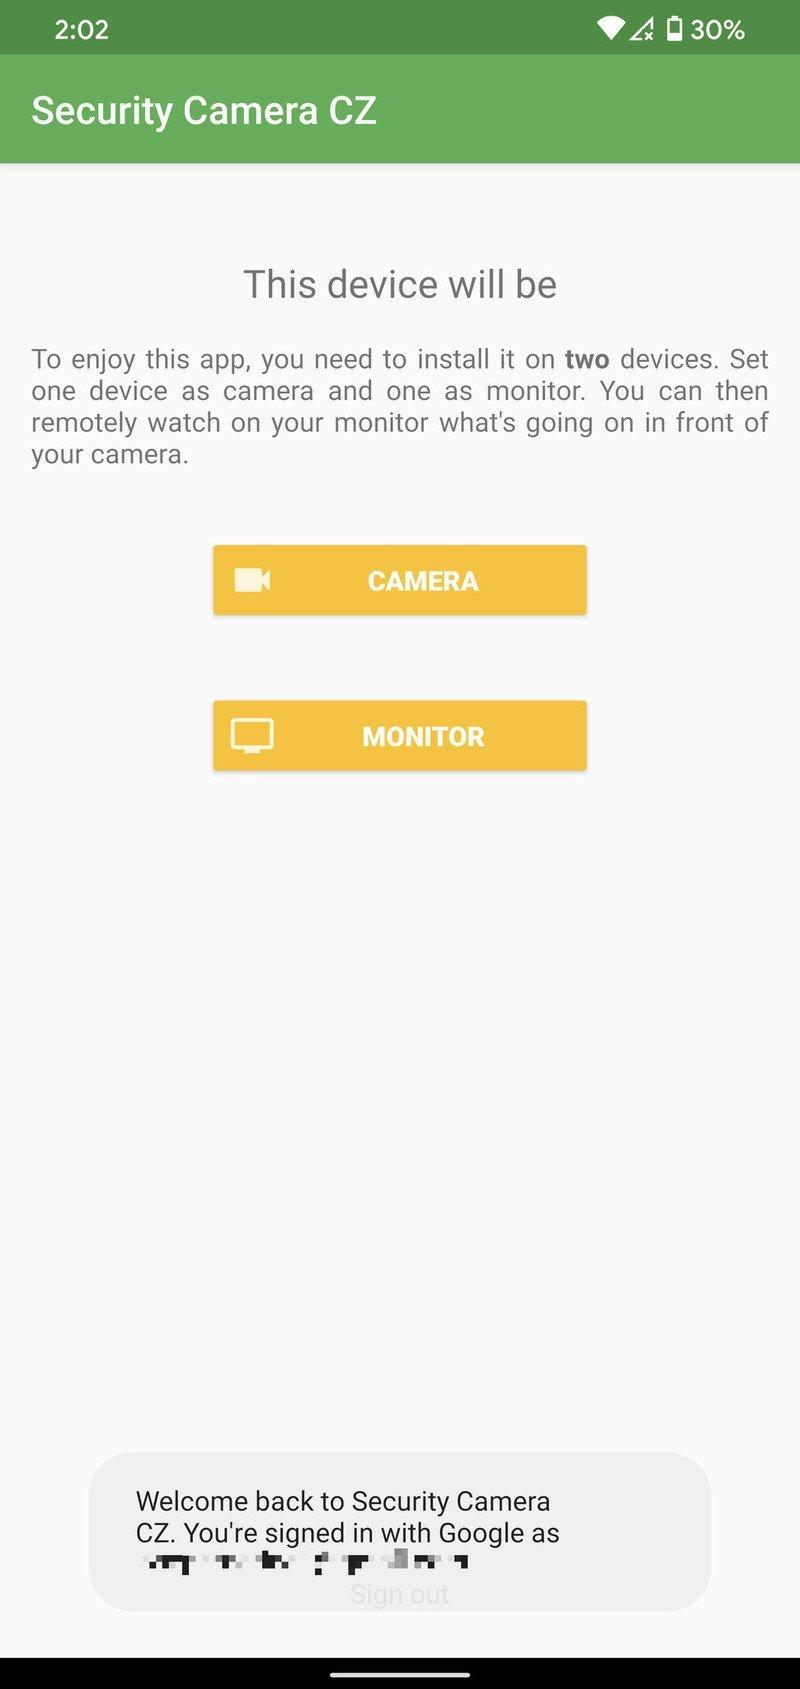 security-camera-cz-viewer-3-edits.jpg?it